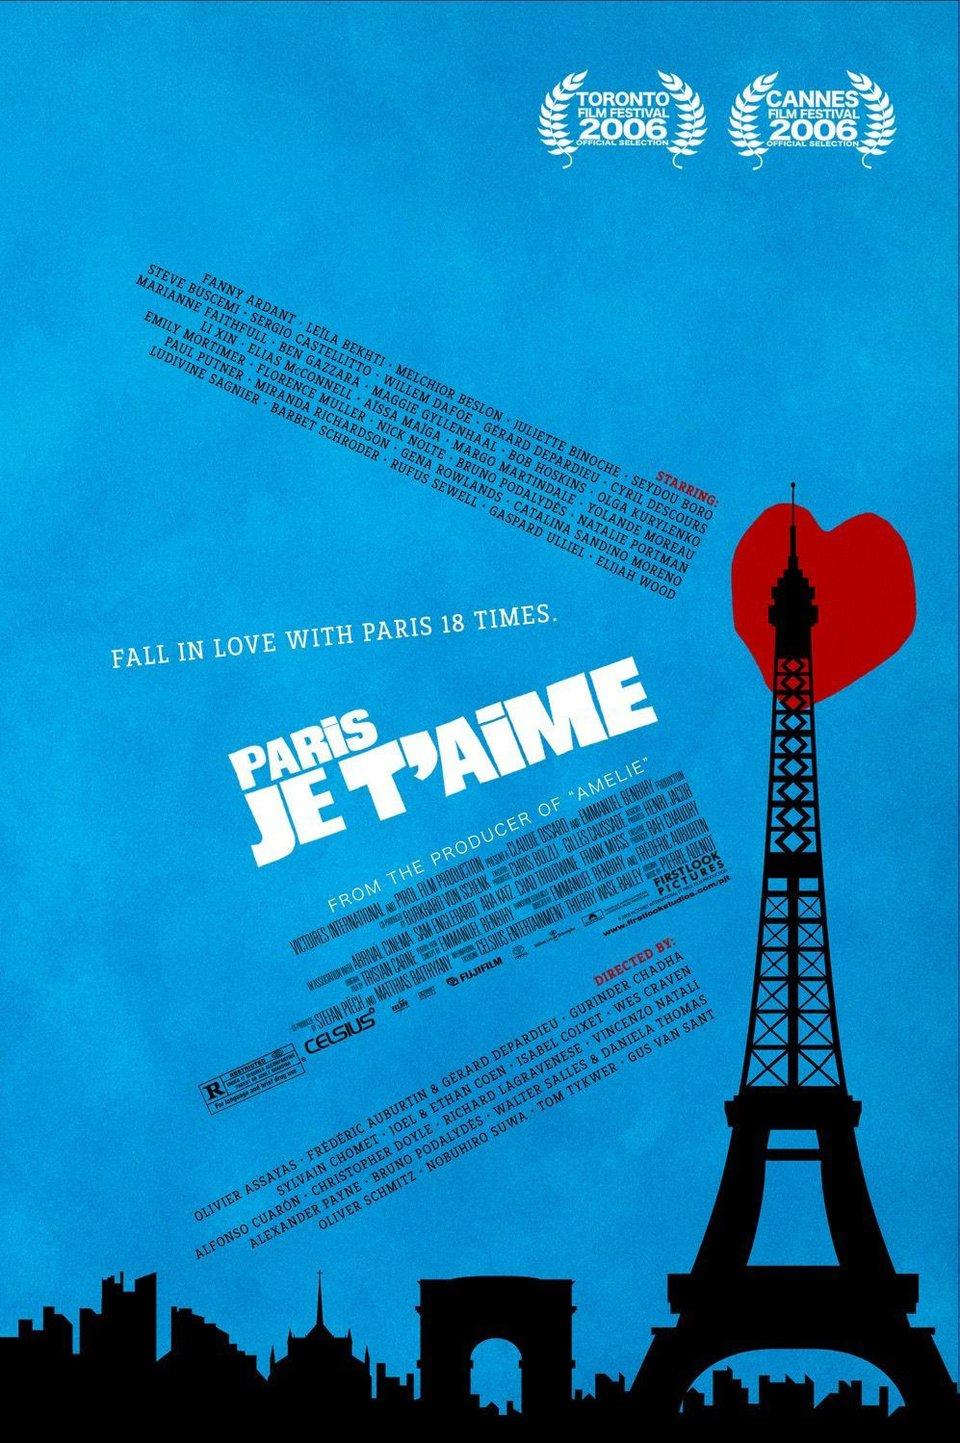 Все постеры париж я люблю тебя